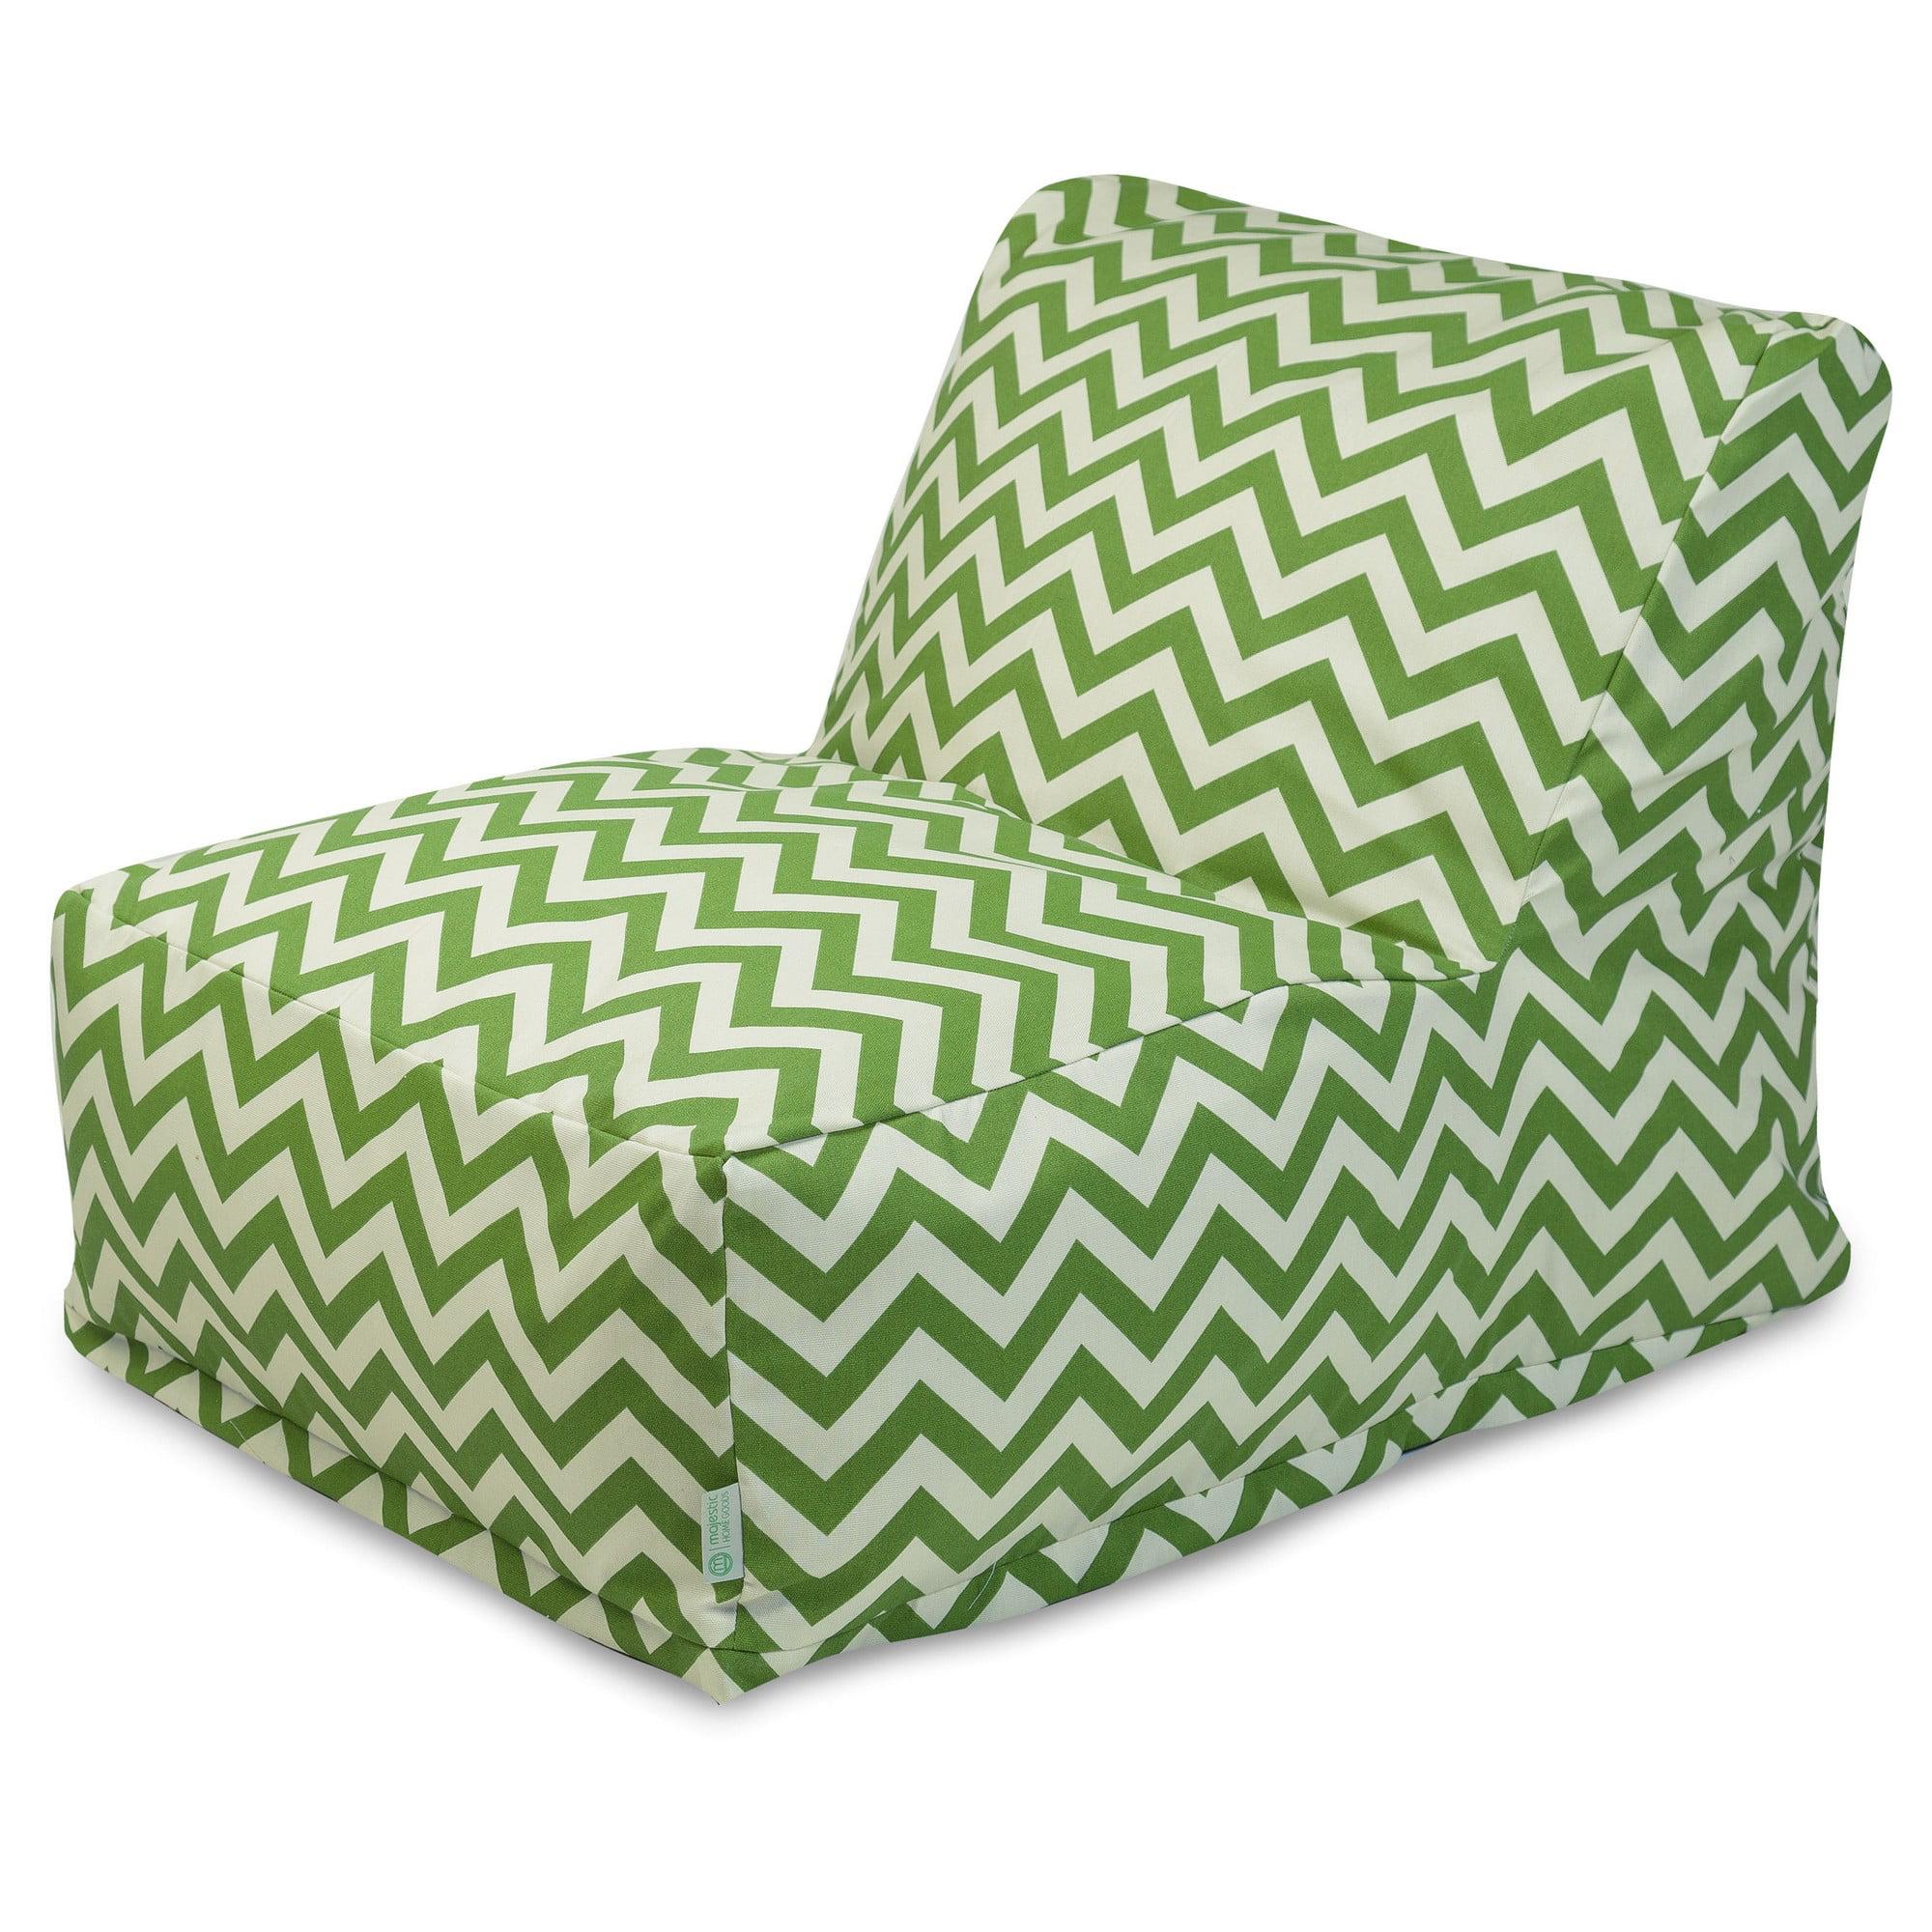 Majestic Home Goods Indoor Outdoor Sage Chevron Chair Lounger Bean Bag 36  In L X 27 In W X 24 In H   Walmart.com